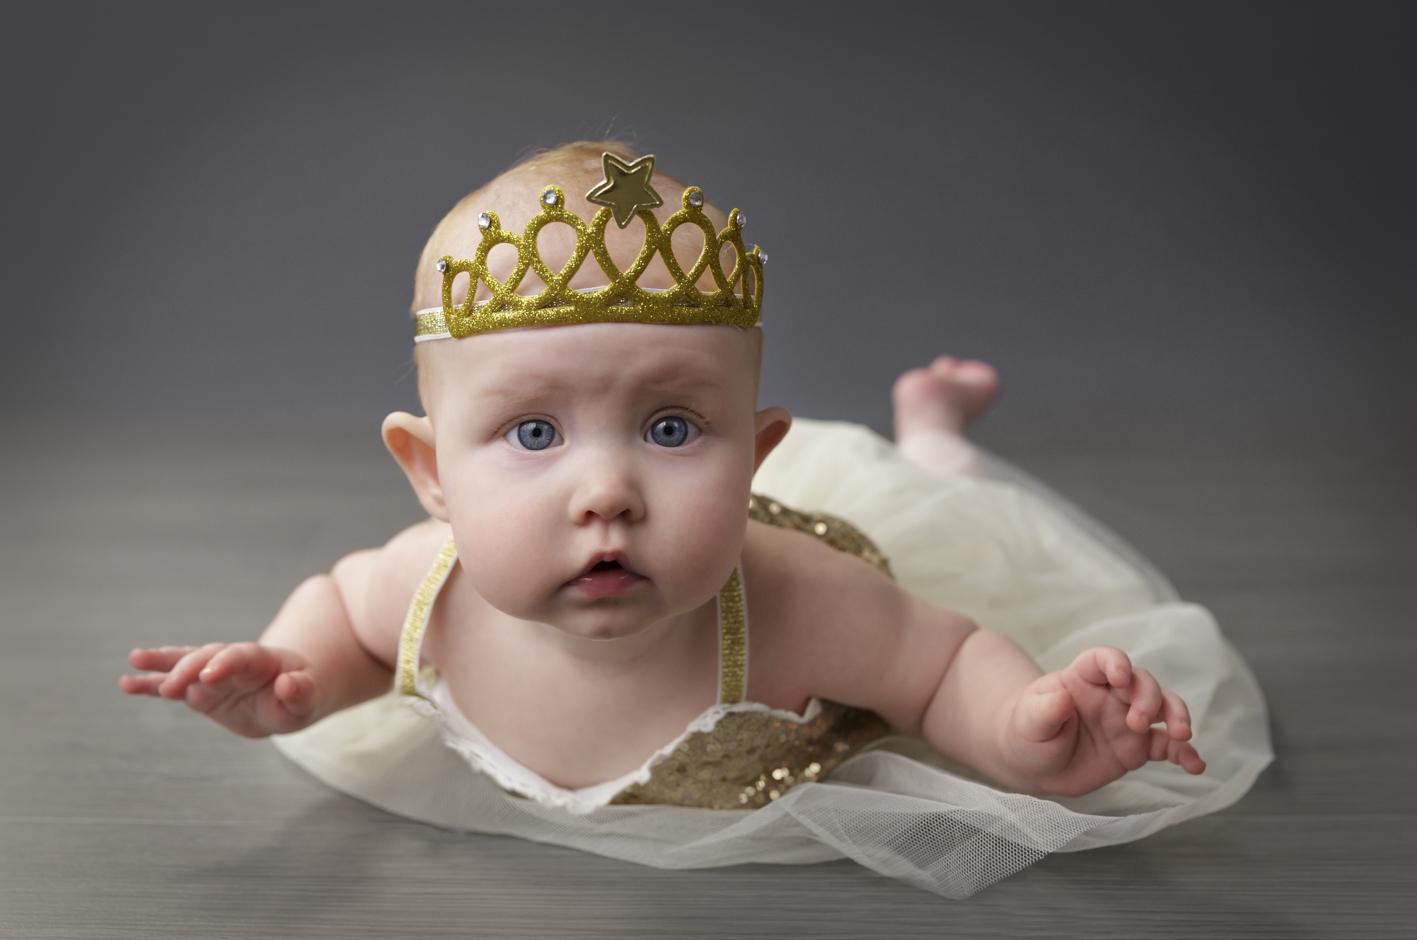 3 month baby ballerina